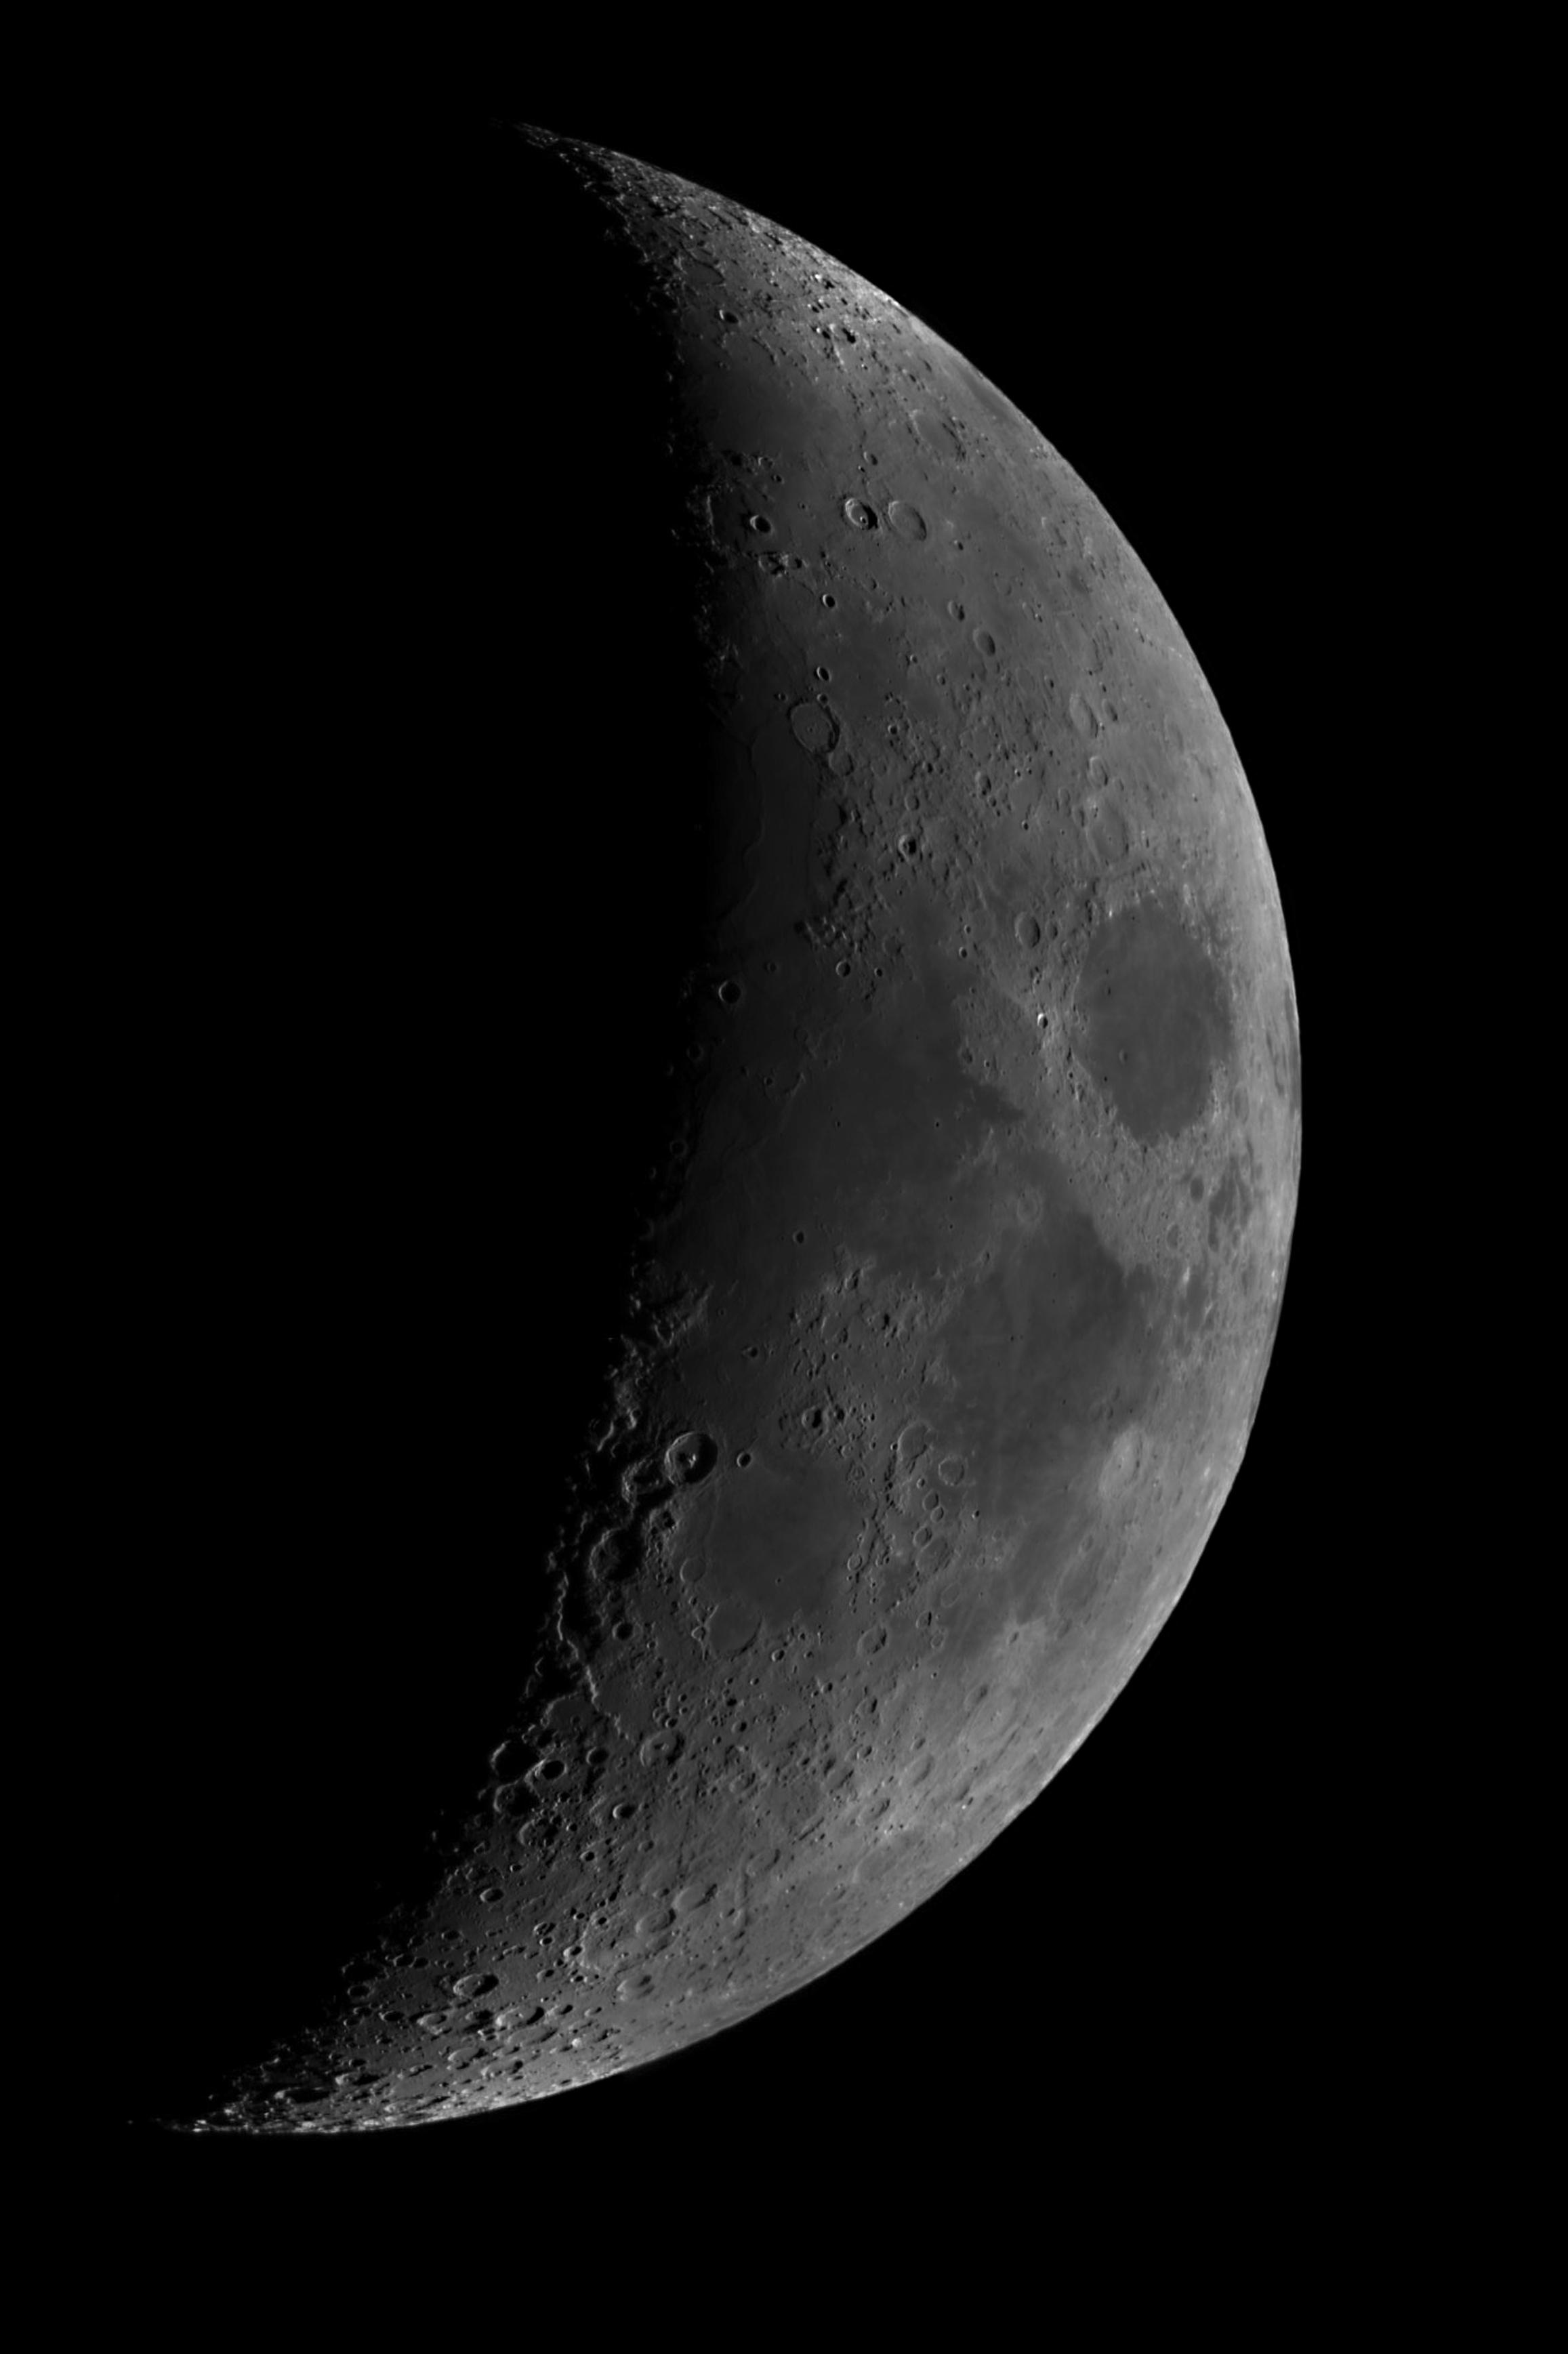 https://www.astrofilicernusco.org/storage/2021/02/luna-19_02_2021.jpg